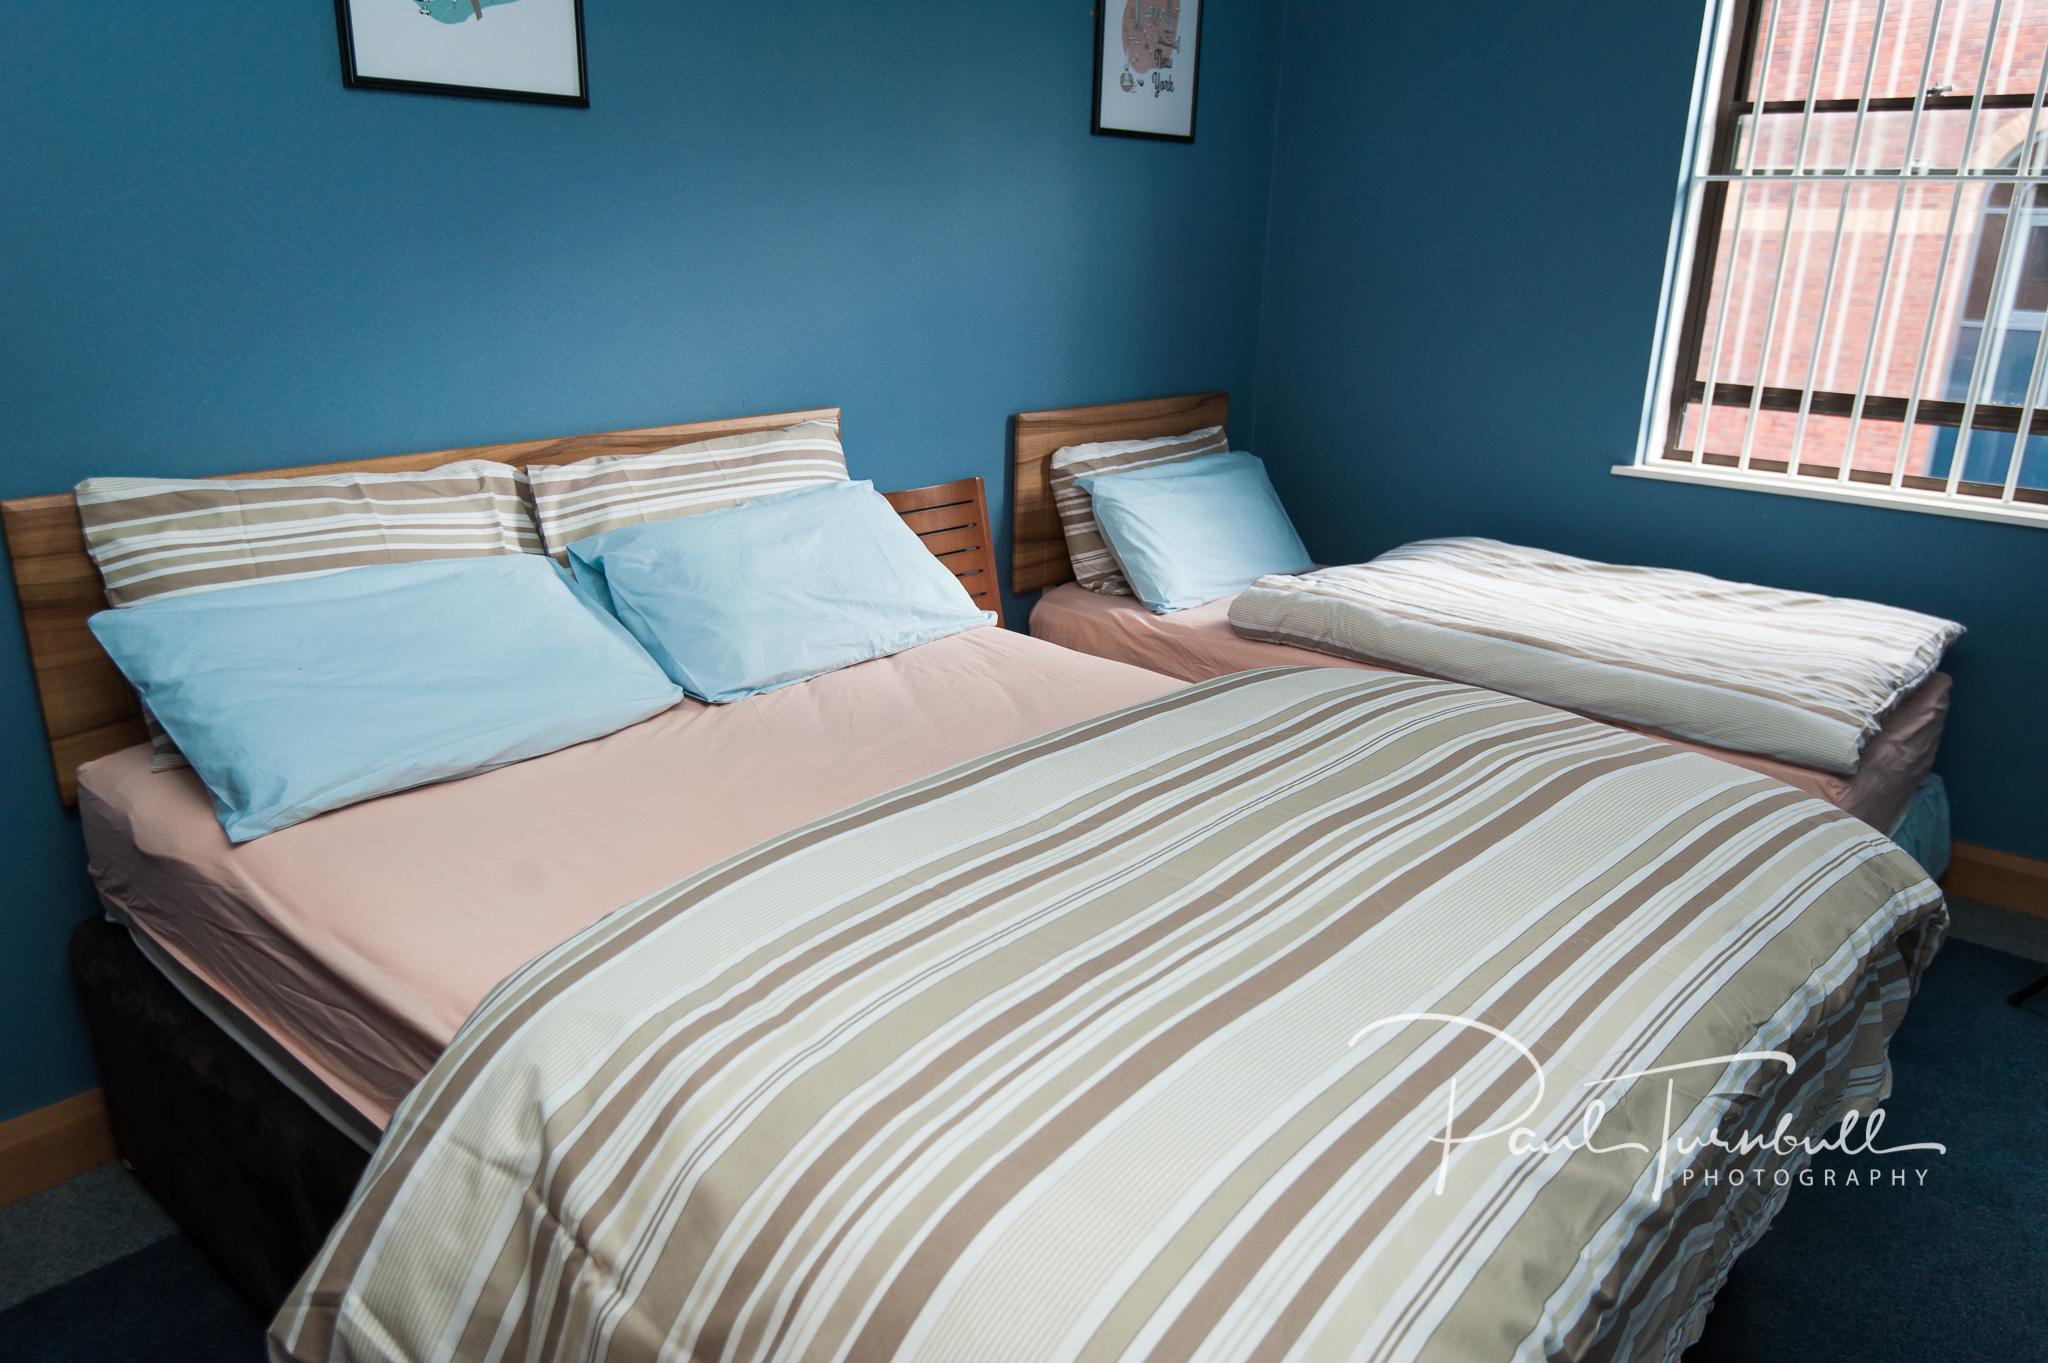 commercial-property-photographer-leeds-yorkshire-rs-hostels-009.jpg